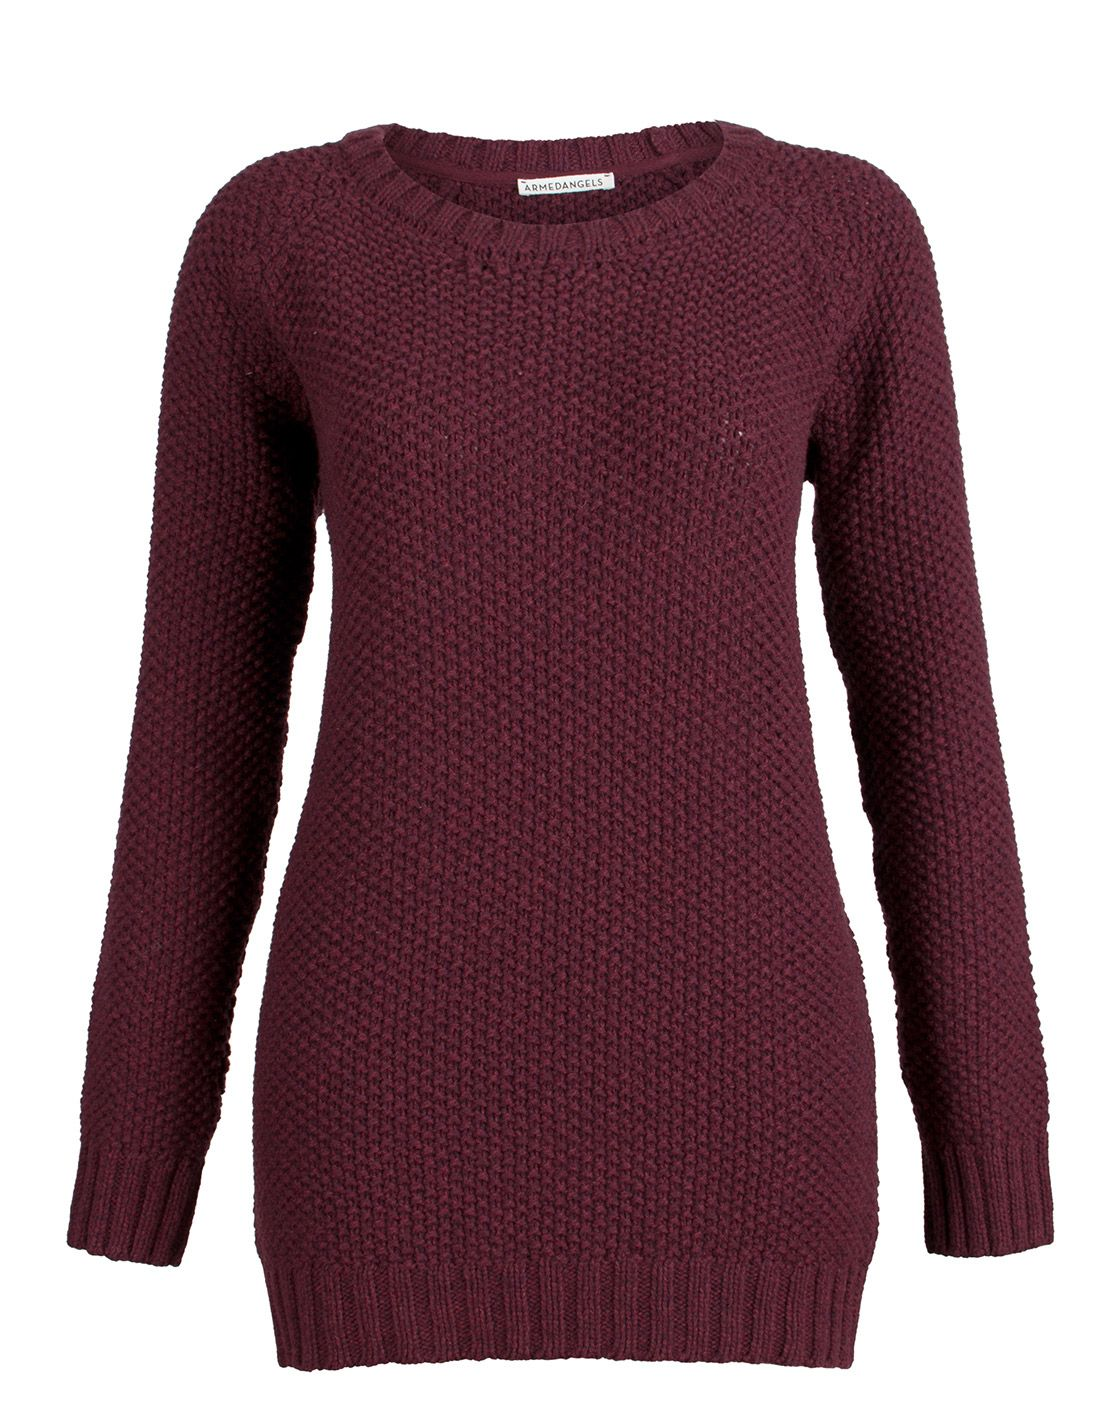 Roobin Avenue Womens Casual Striped Knit V-Neck Long Length Cardigan ...